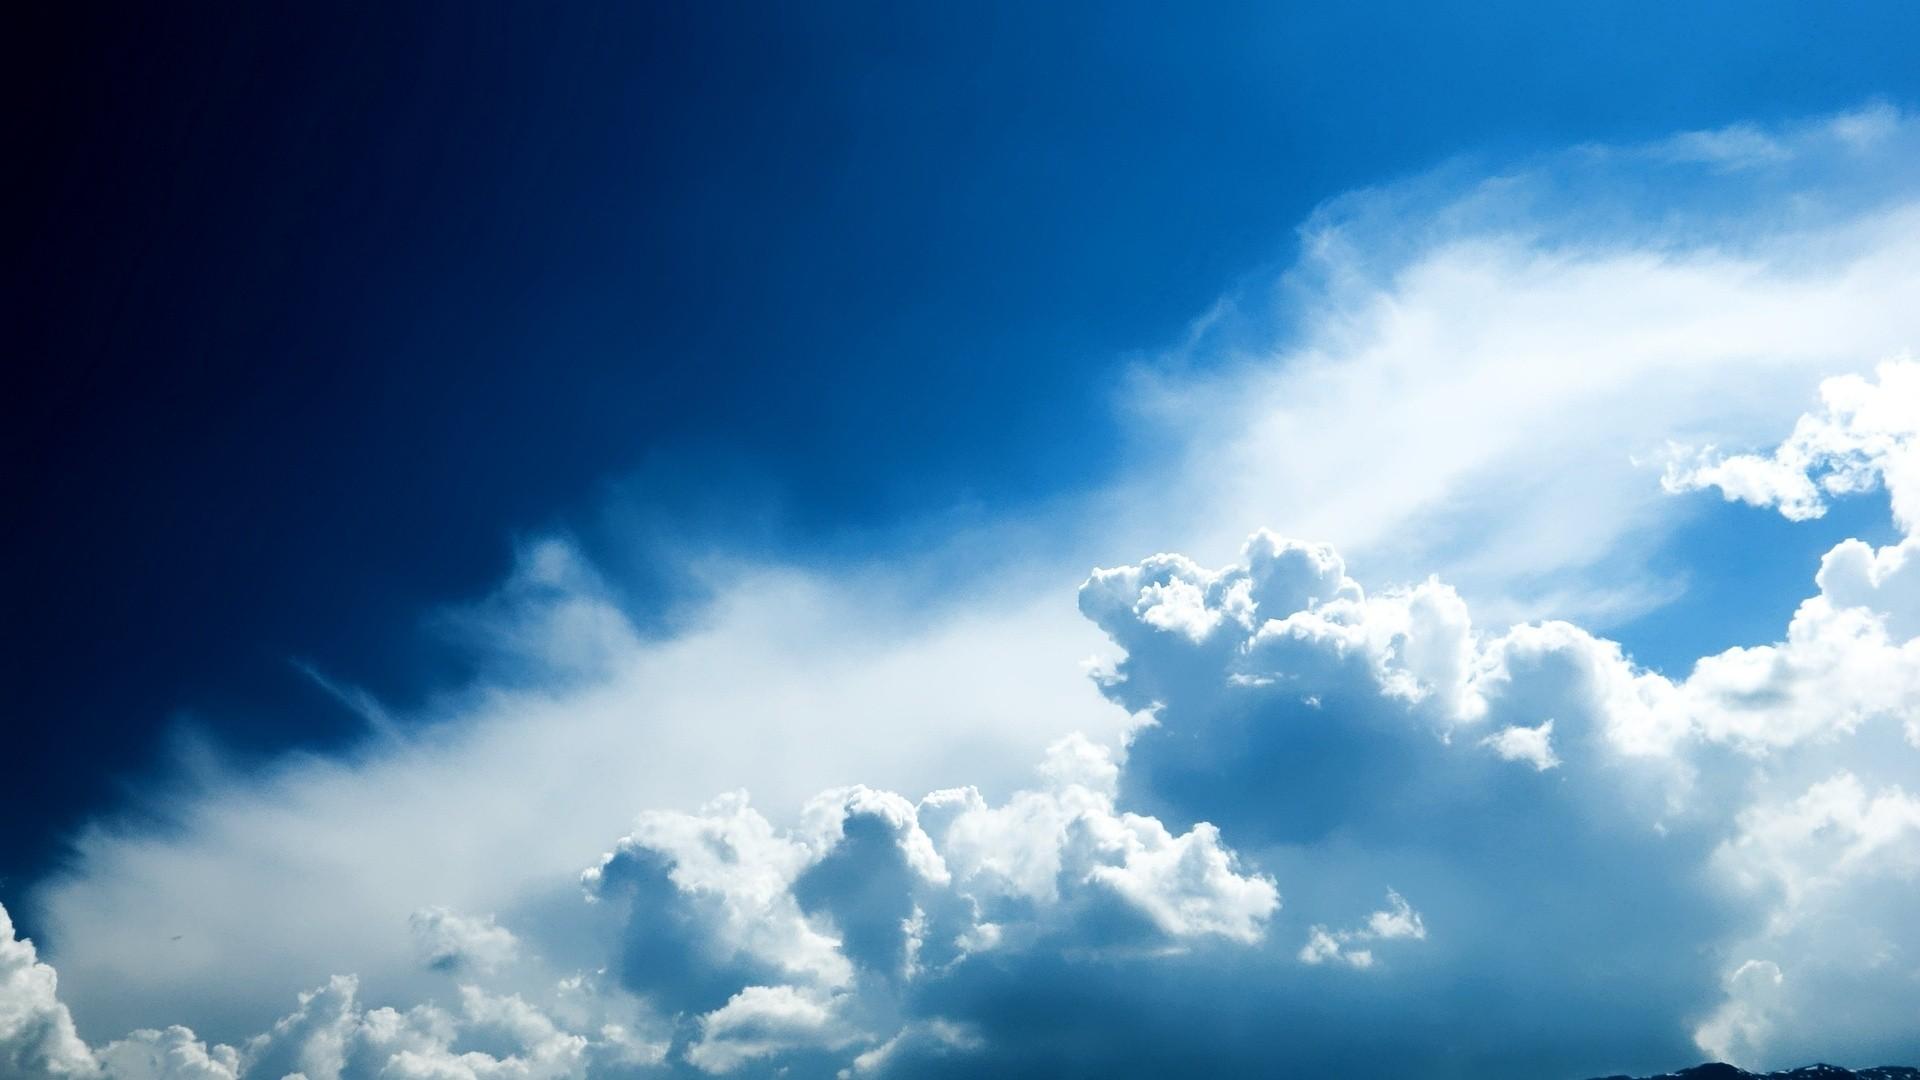 Blue Cloud Download Wallpaper